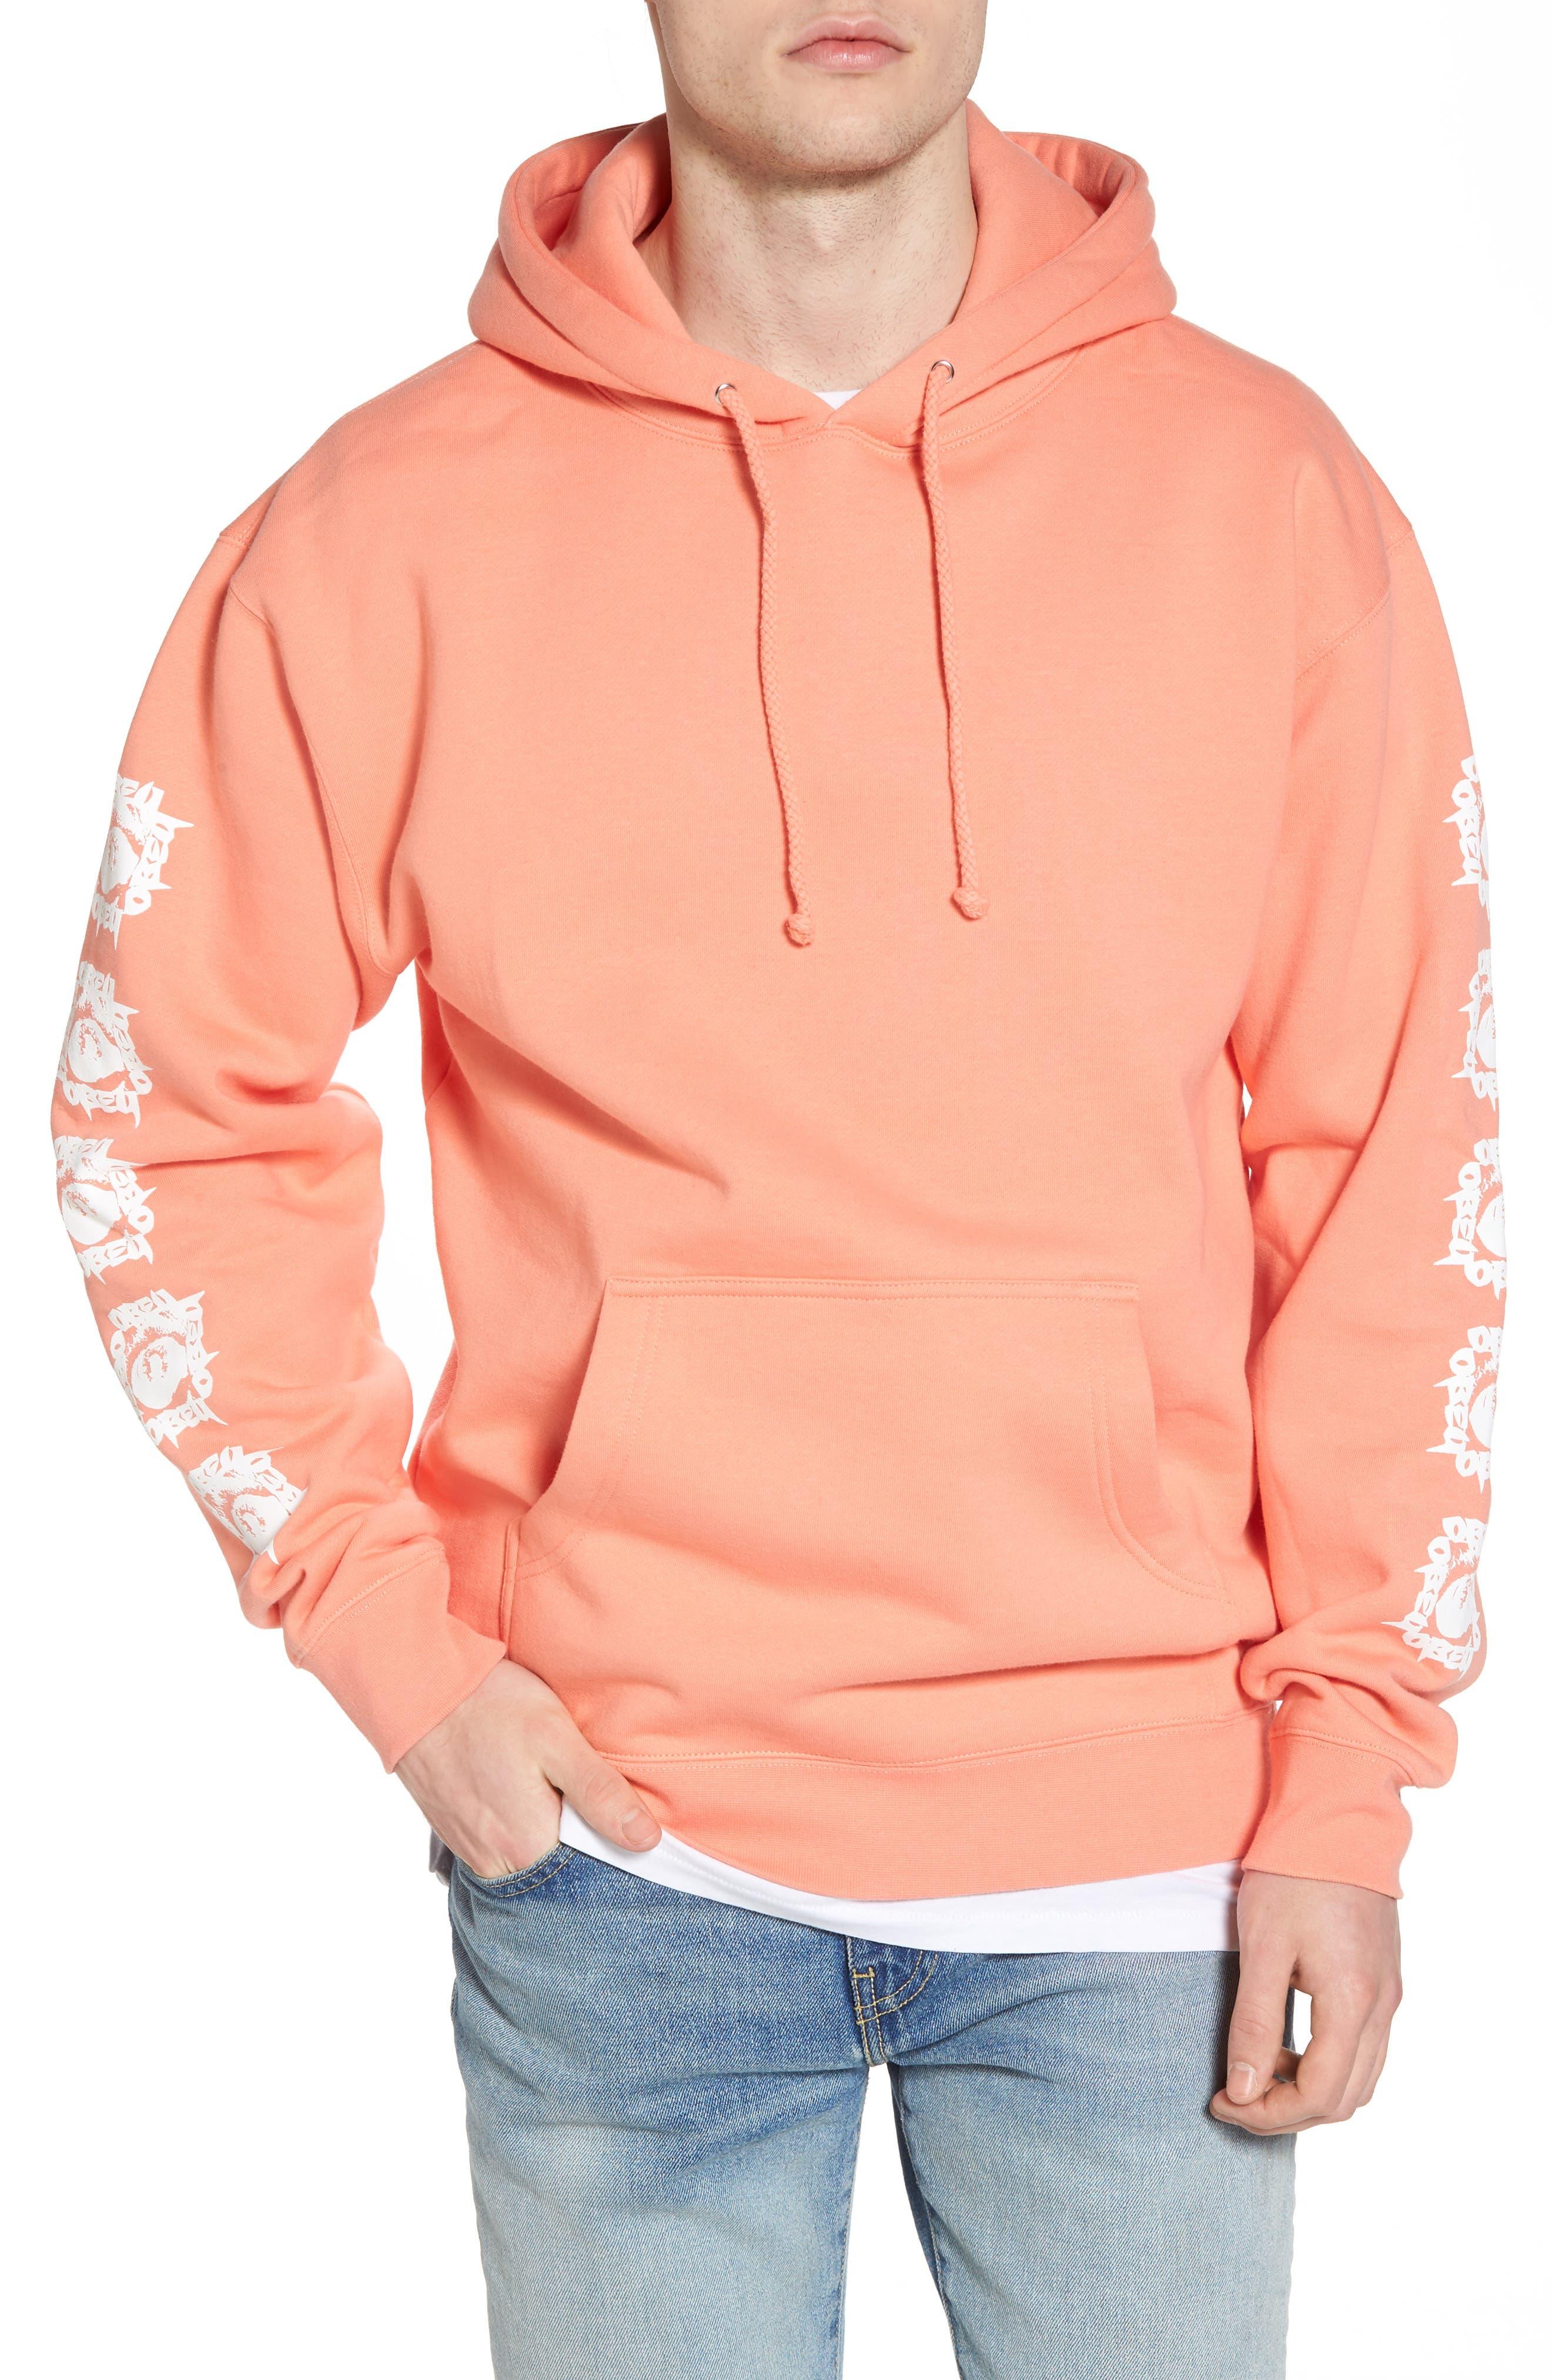 Tunnel Vision Hoodie Sweatshirt,                         Main,                         color,